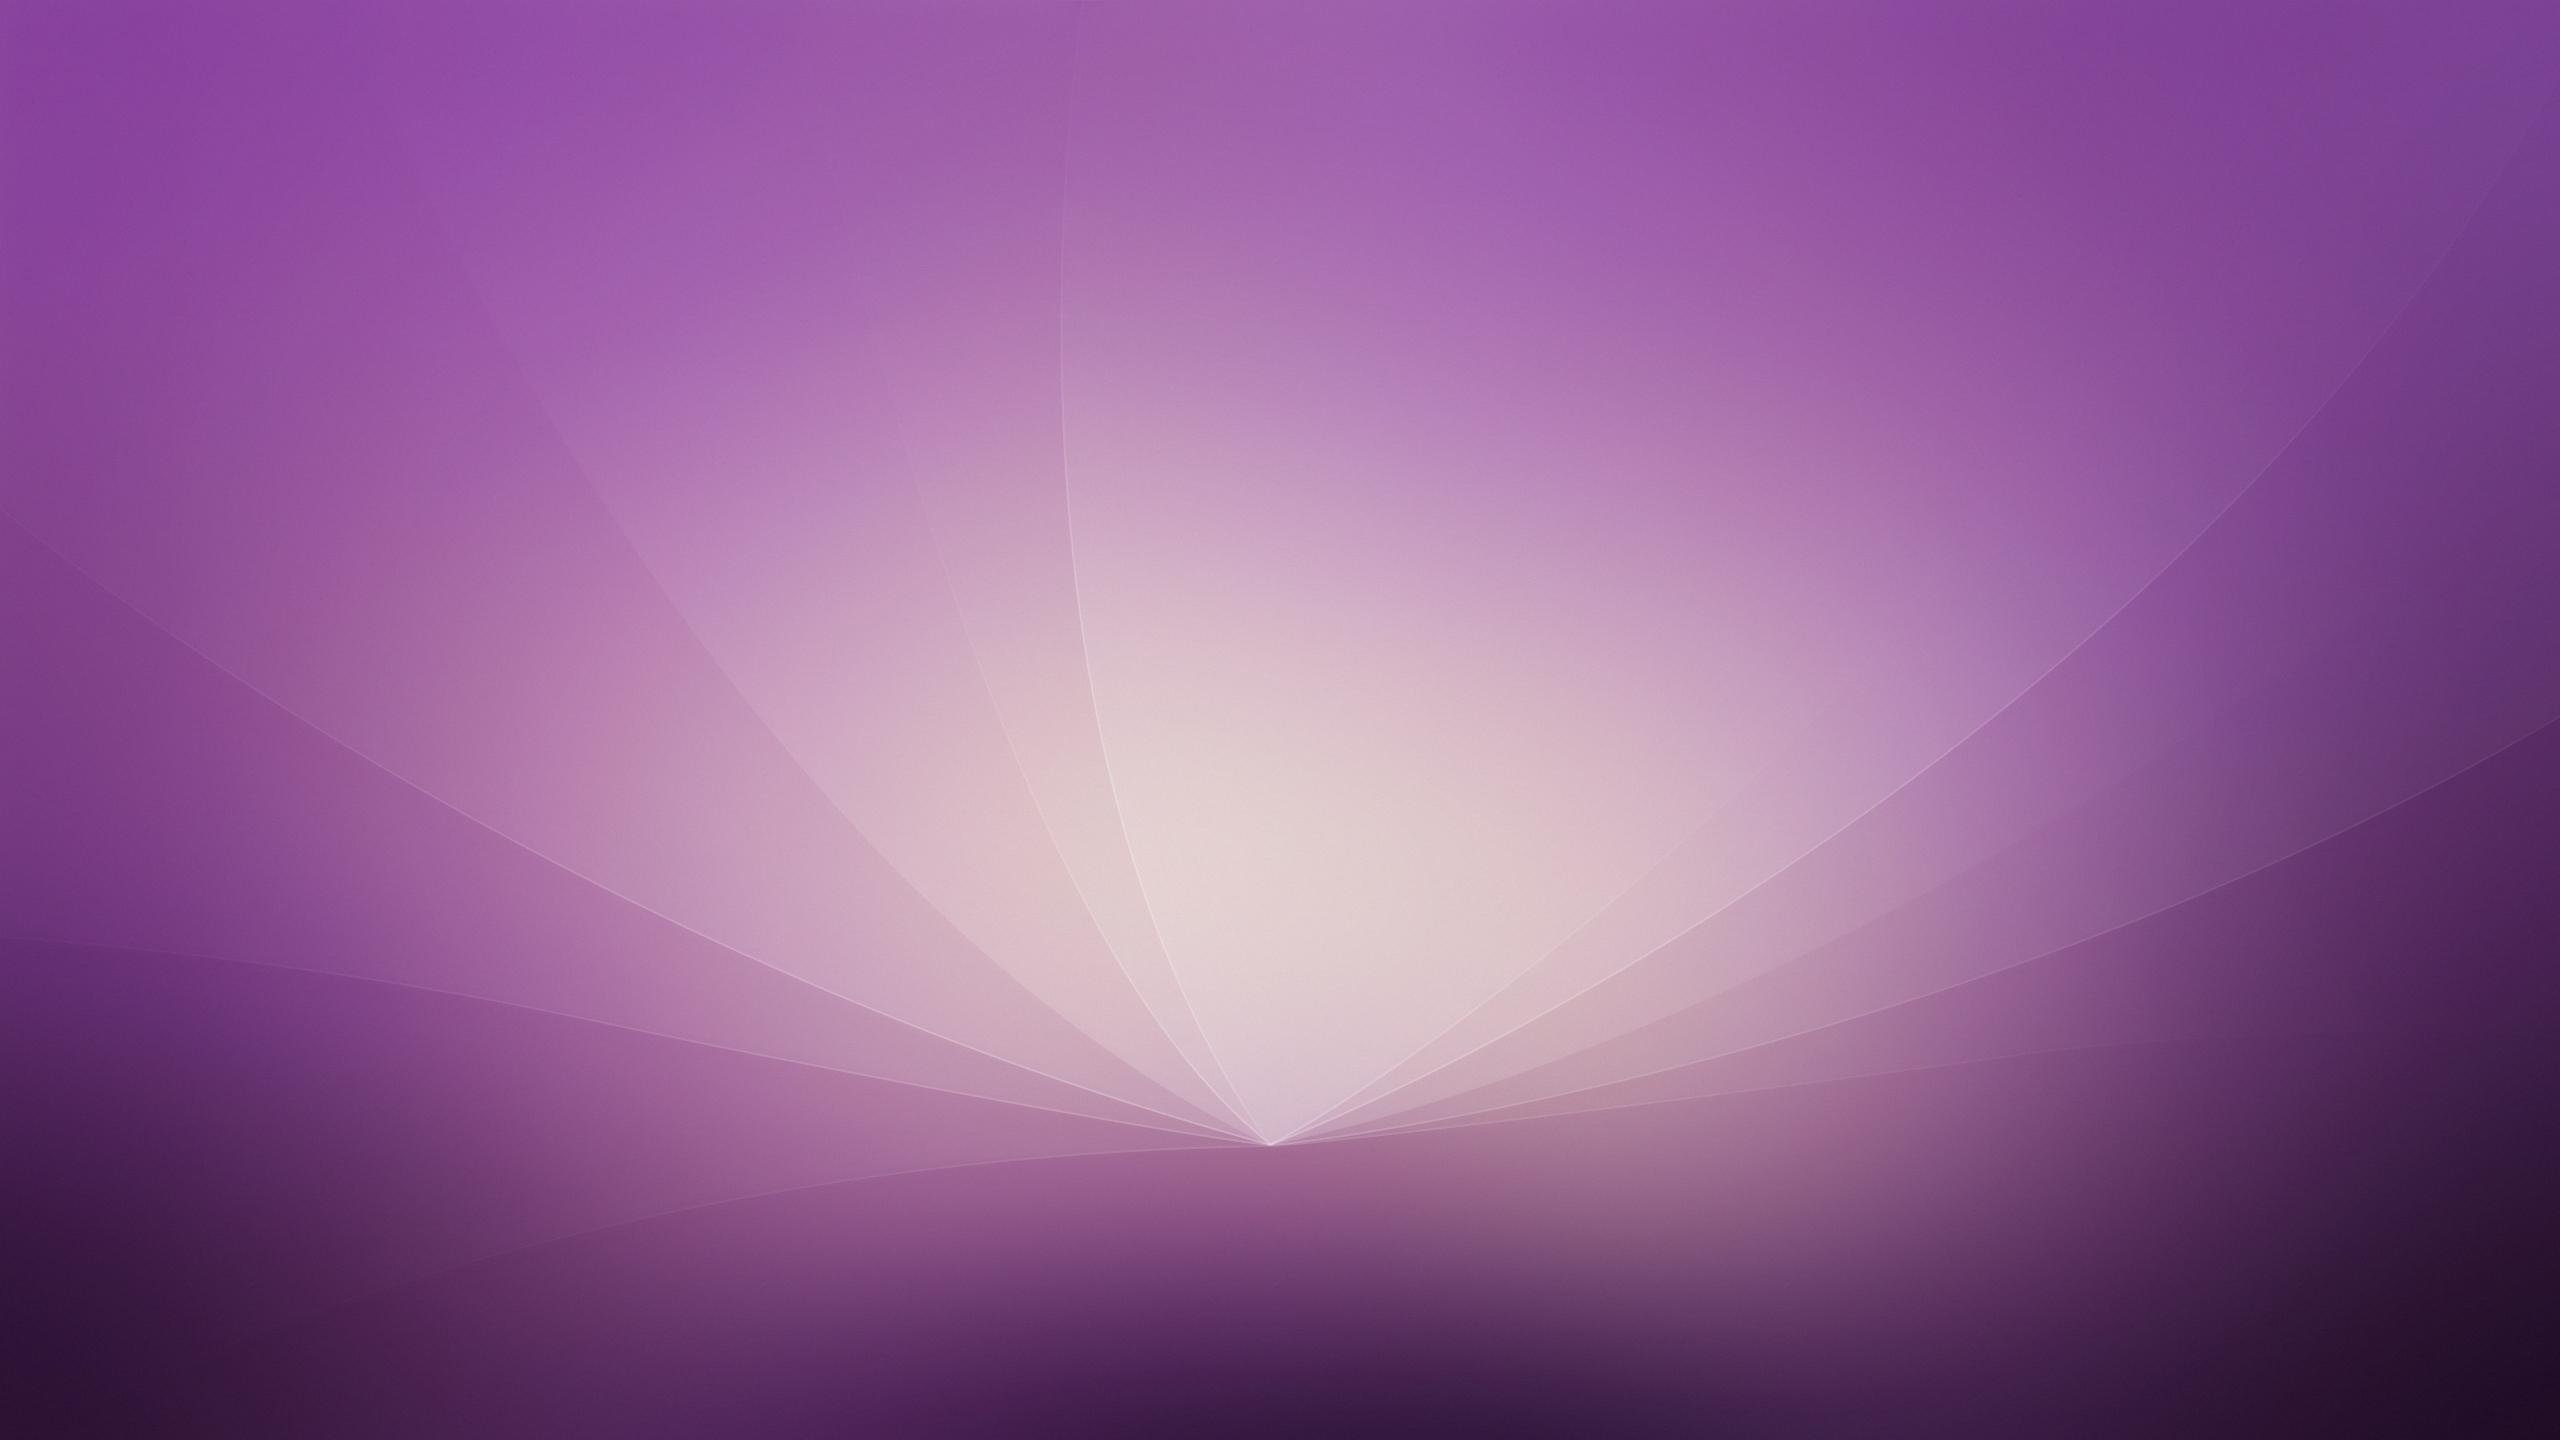 Light Purple Wallpaper 2649 2560 x 1440   WallpaperLayercom 2560x1440